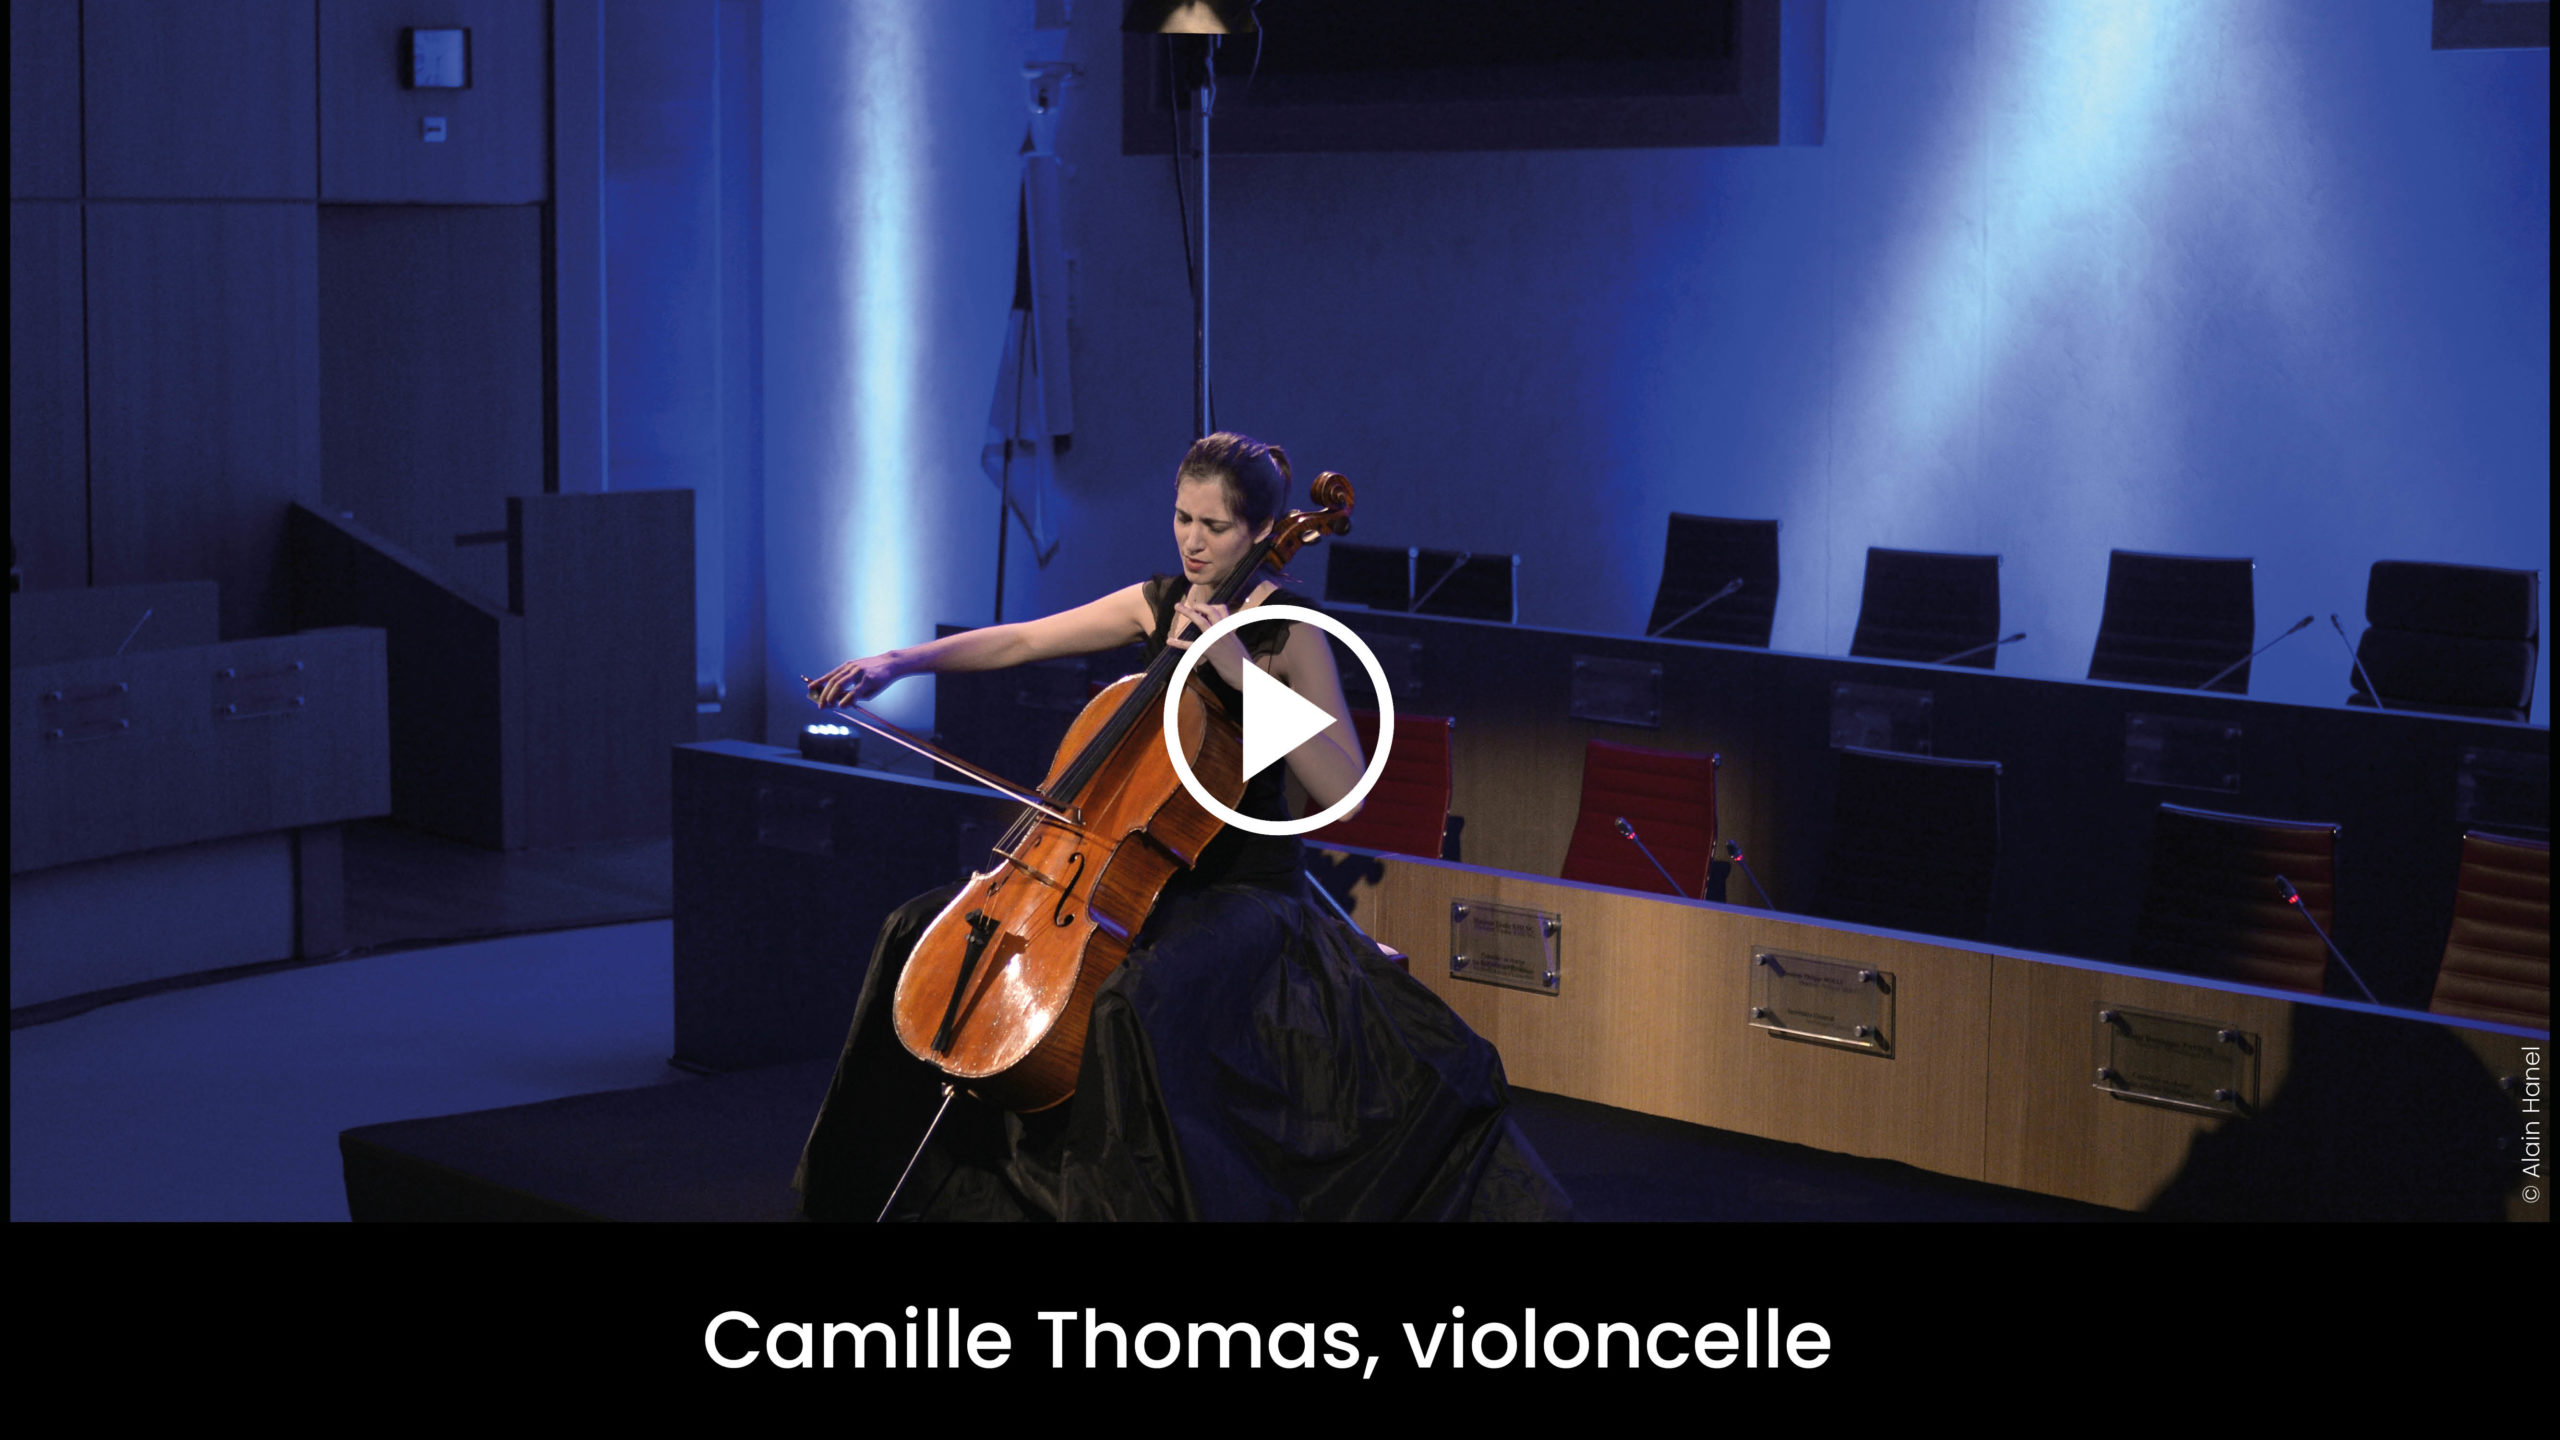 Camille Thomas, violoncelle